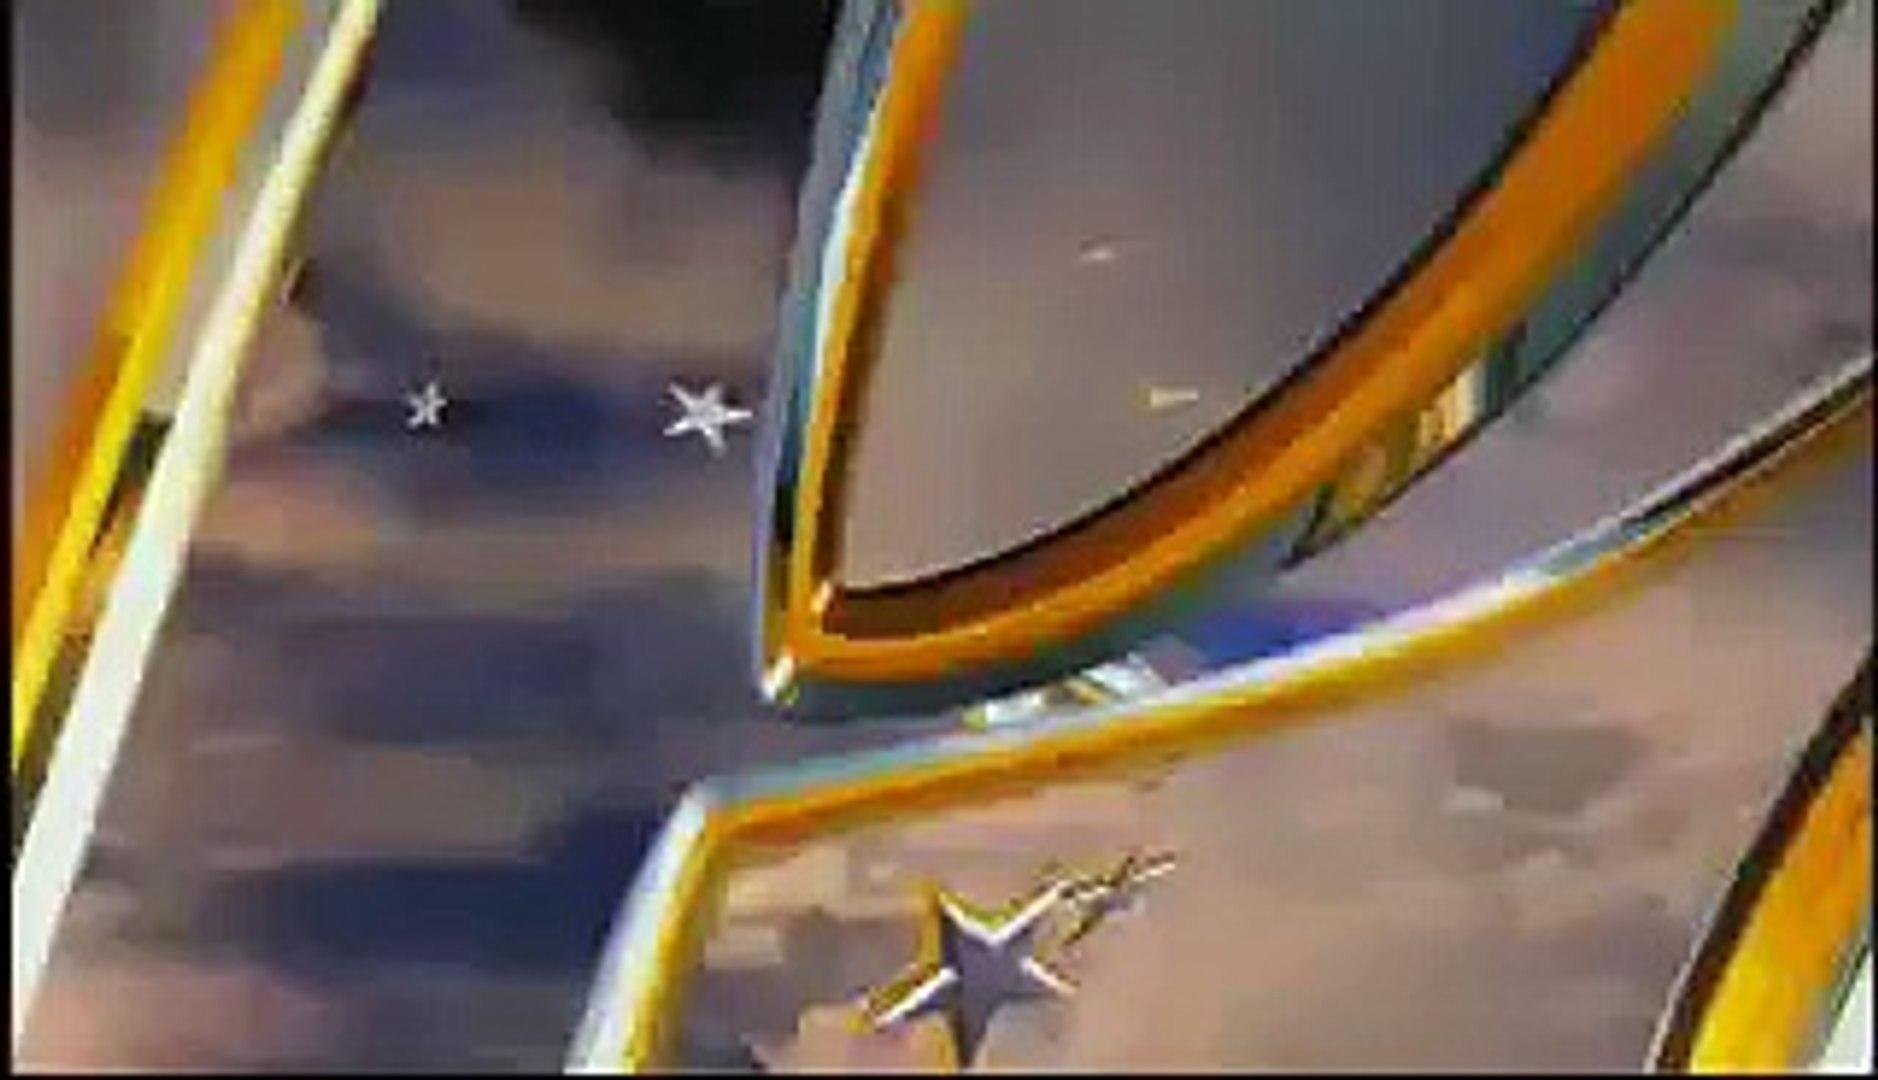 Save the Last Dance 2 (2006) (V) Trailer